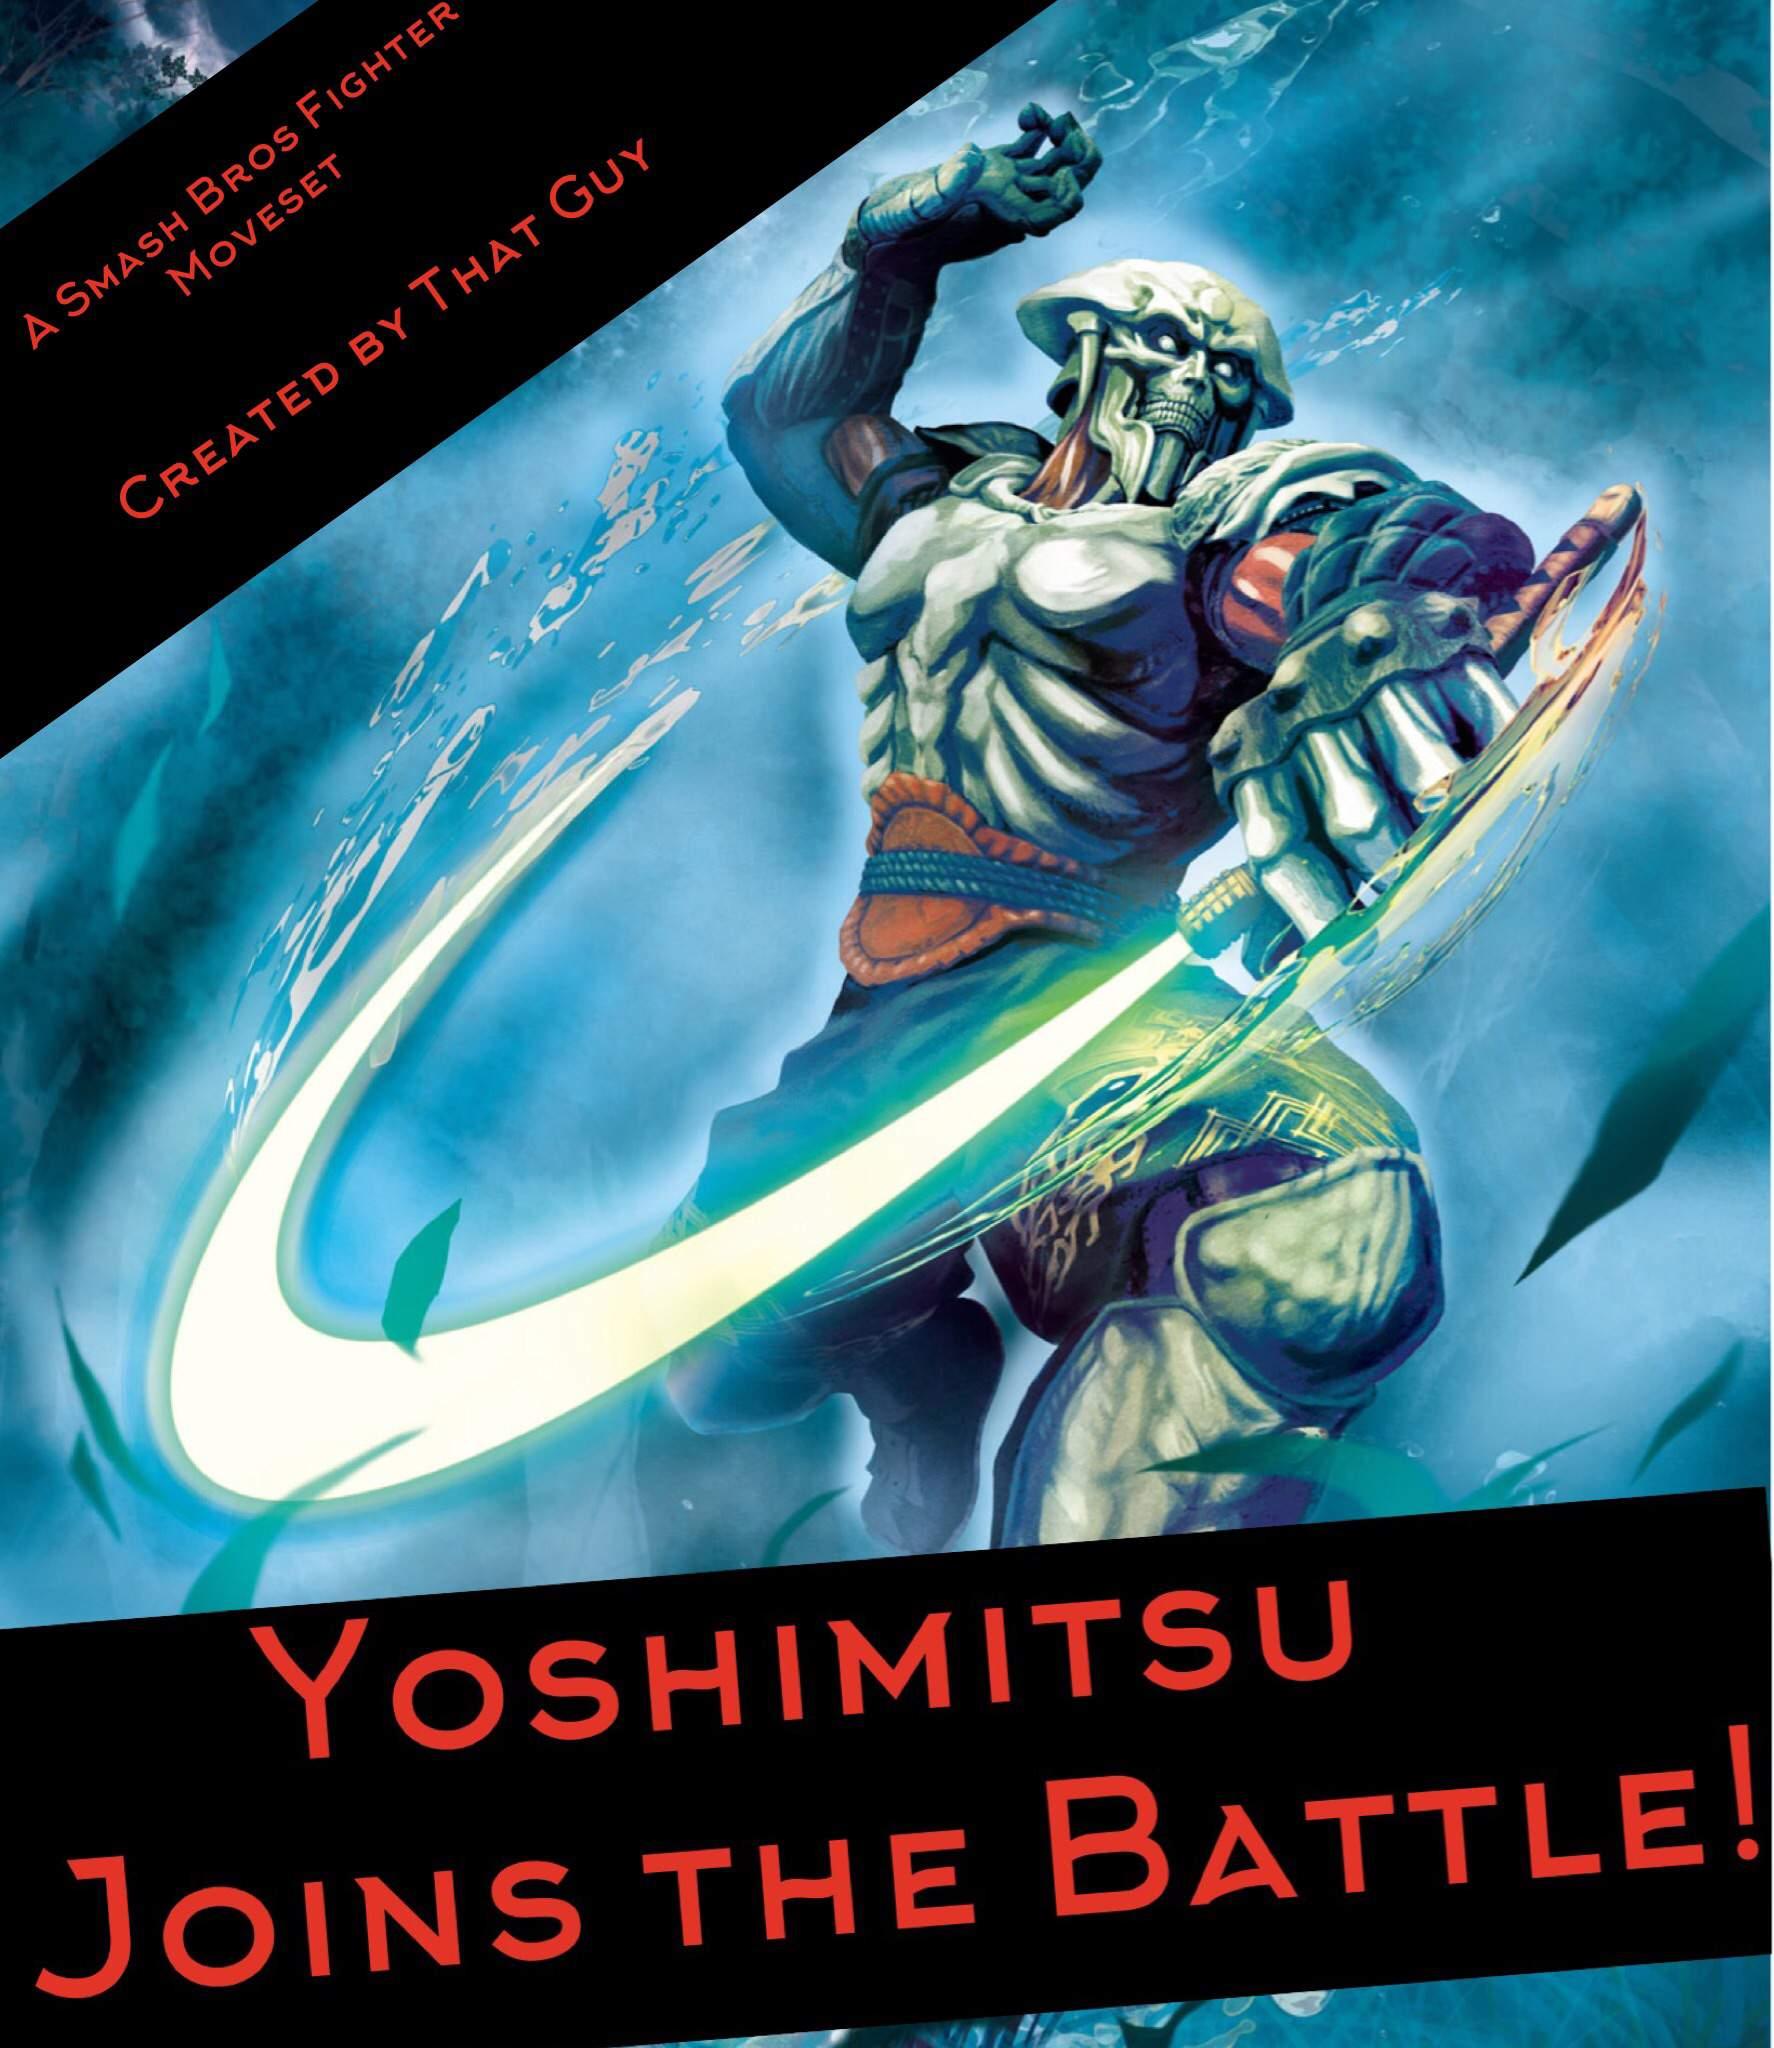 tekken 4 yoshimitsu moves ps2